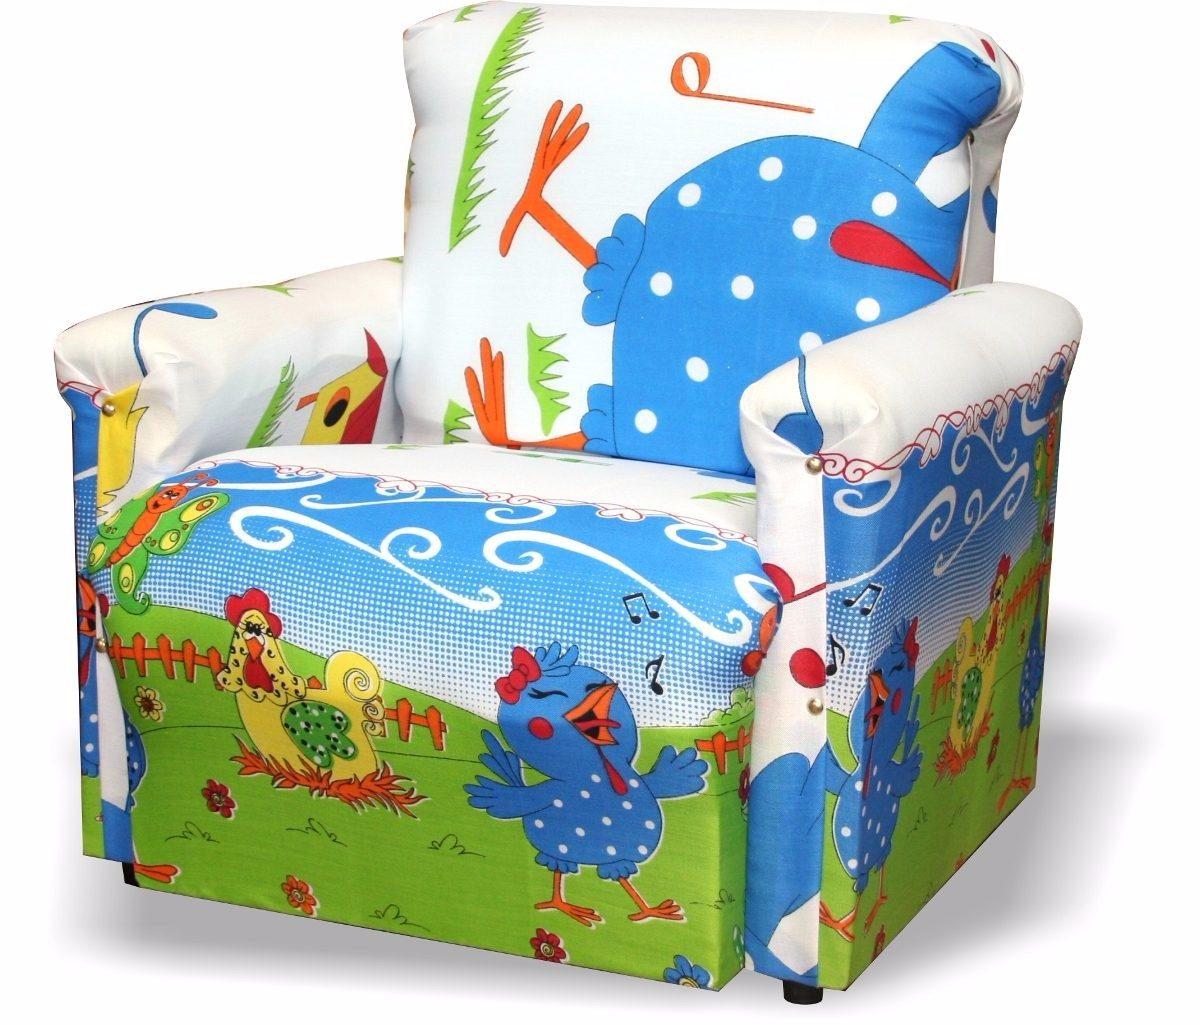 Mini Sofa Infantil ( Poltrona Sofazinho,cadeira,pulff